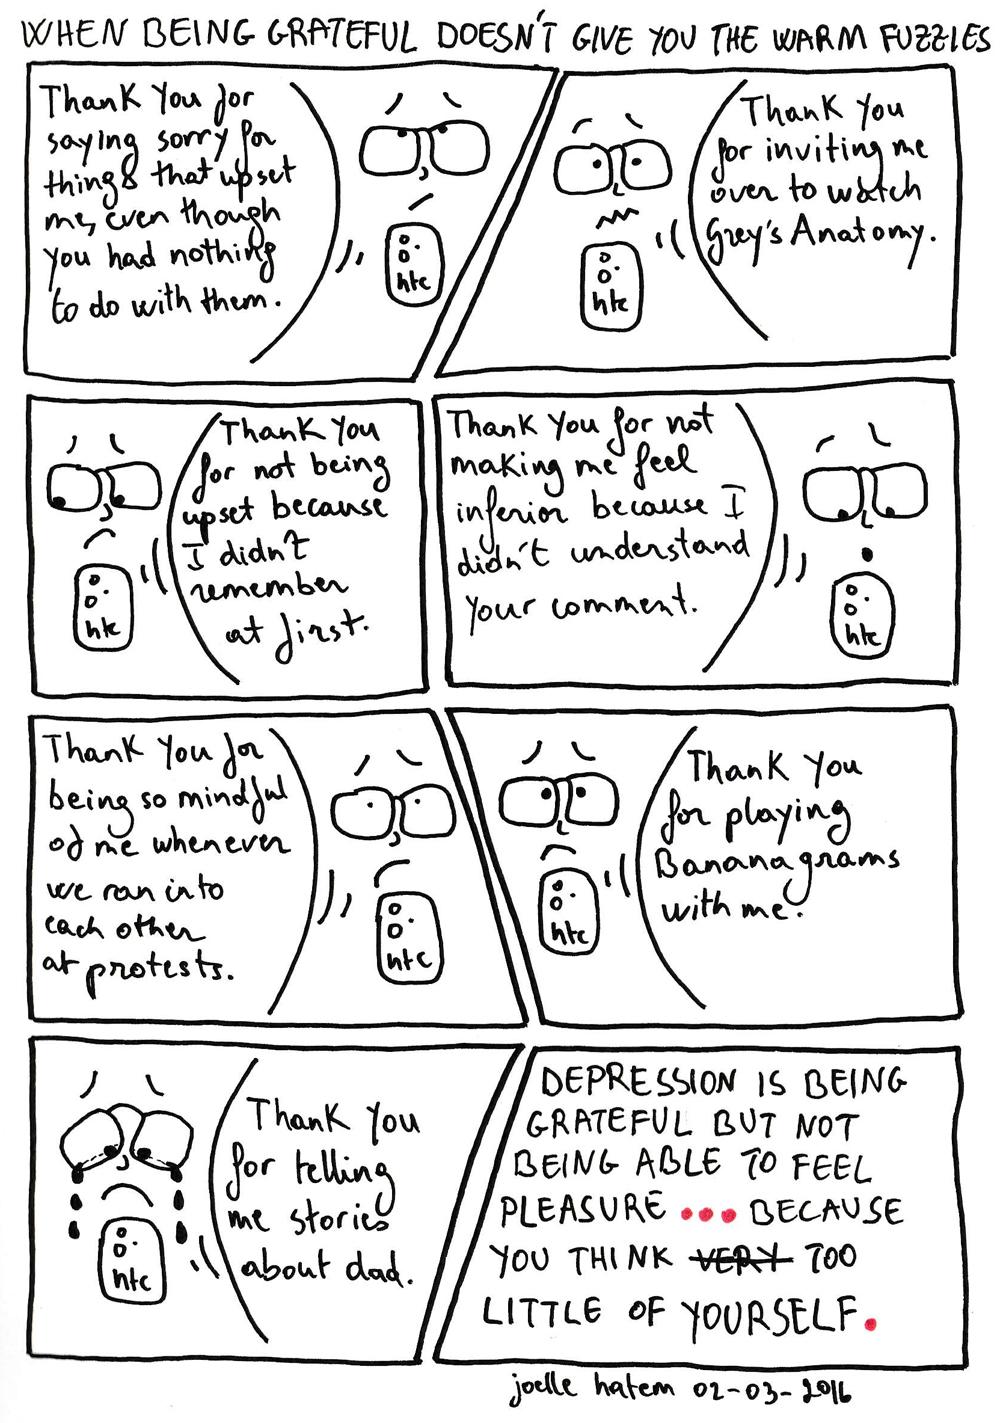 Gratefulness and Depression and Self-Worth